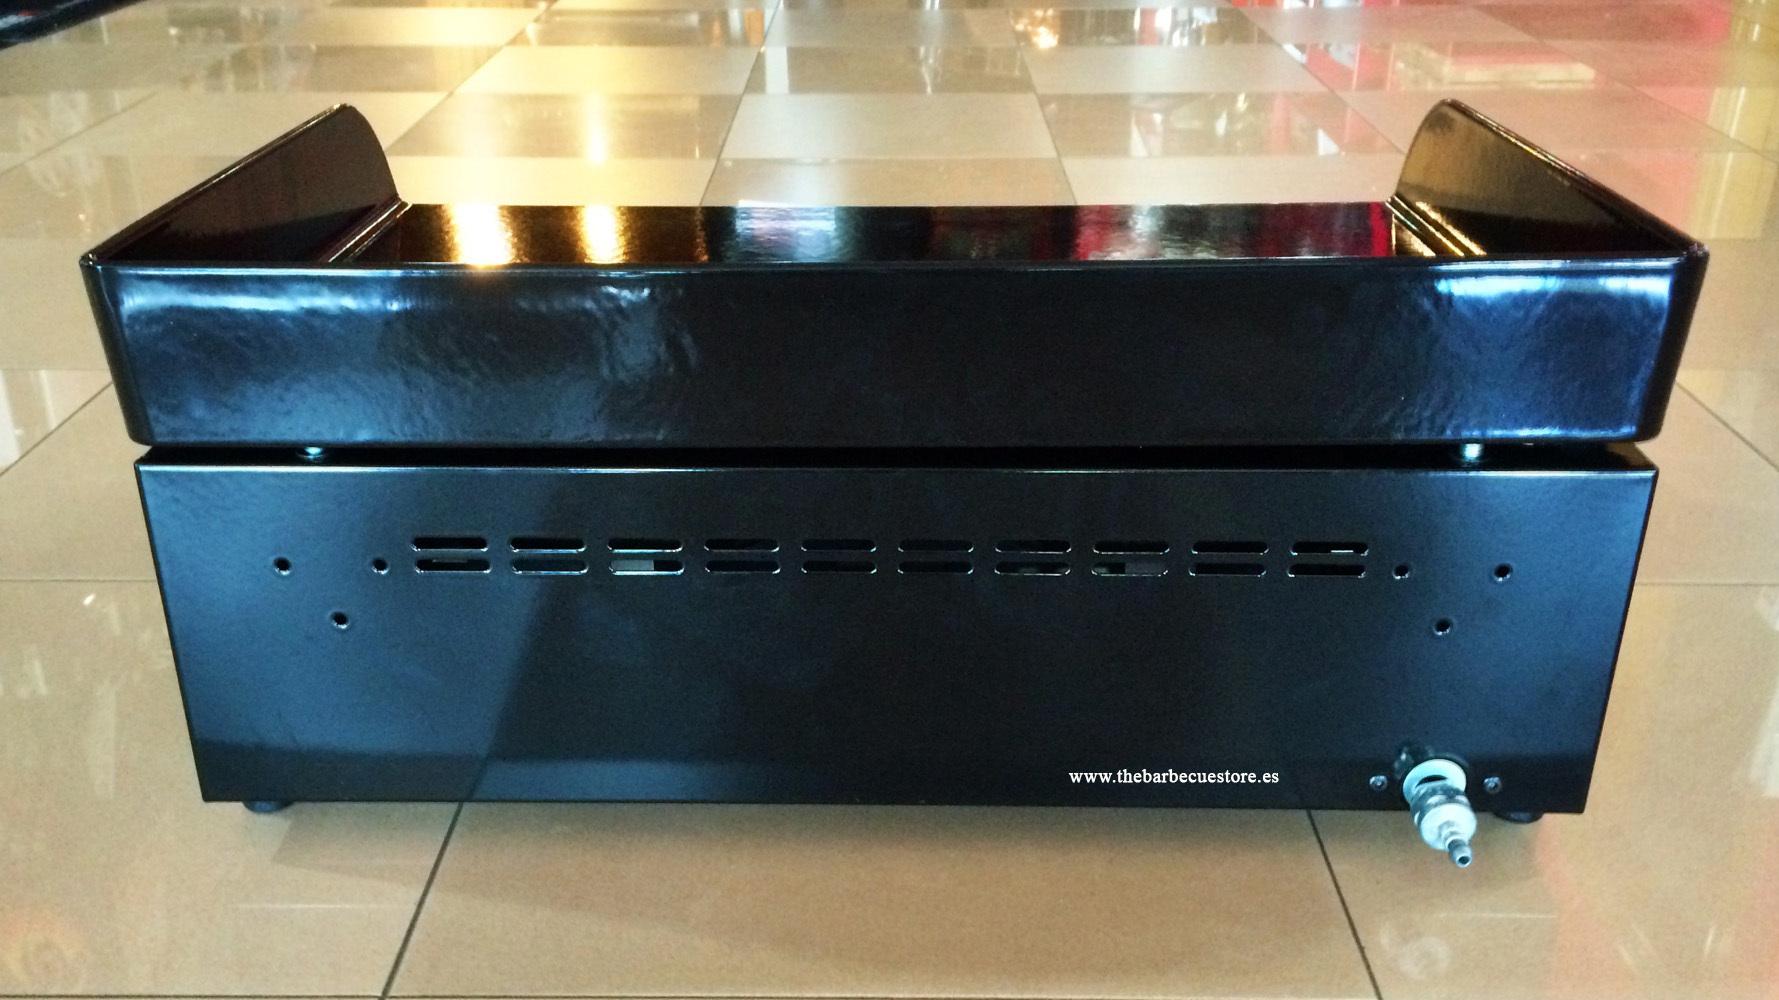 plancha de gas ib rica 600 esmaltada the barbecue store espa a. Black Bedroom Furniture Sets. Home Design Ideas